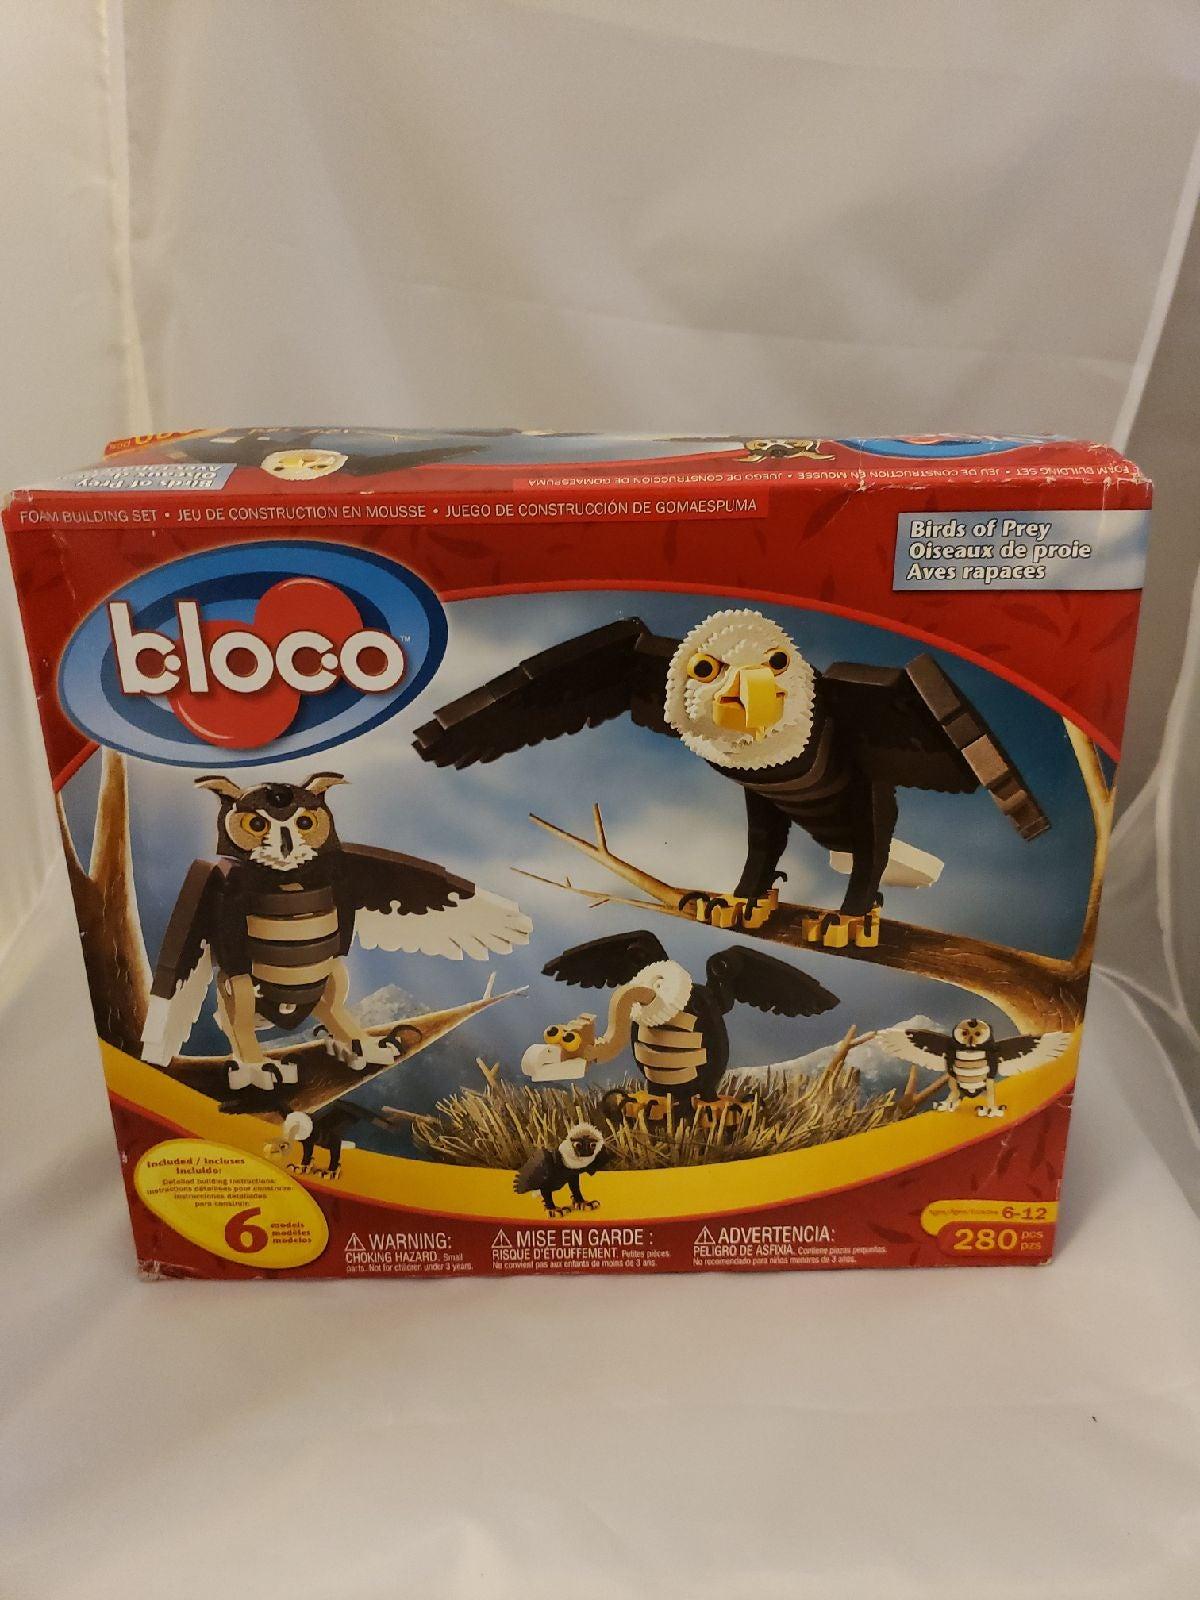 Birds of Prey Building Kit Toy by Bloco